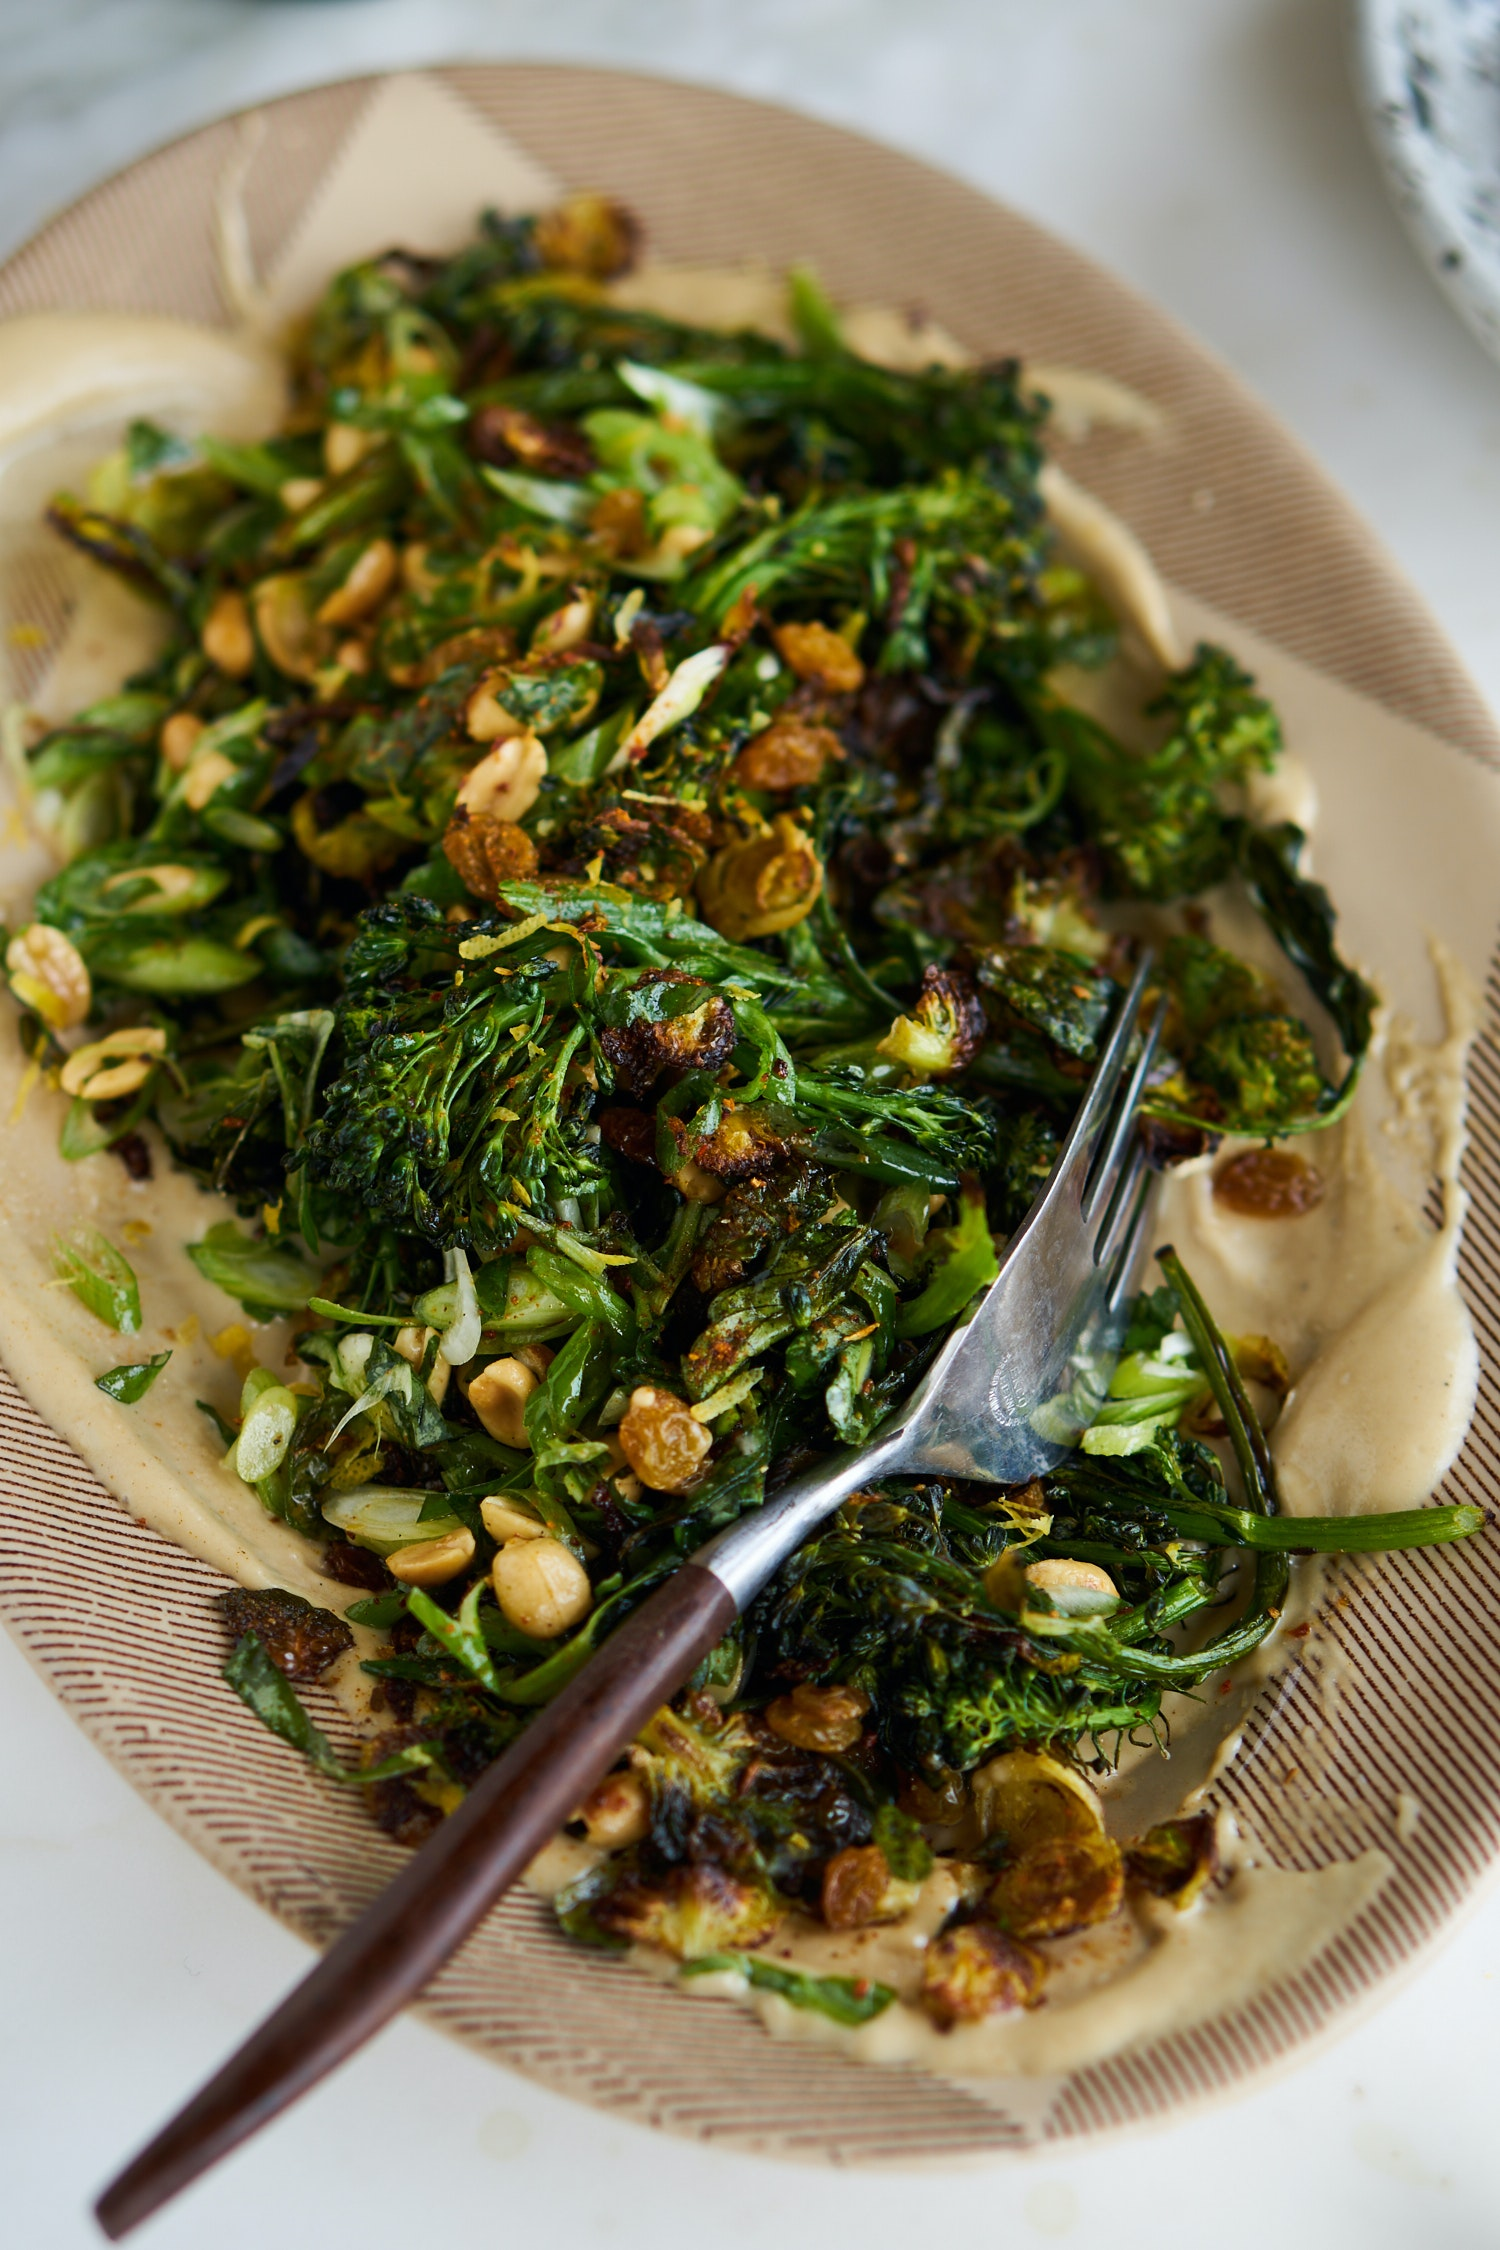 Curried Sheet Pan Broccoli with Peanuts and Tahini